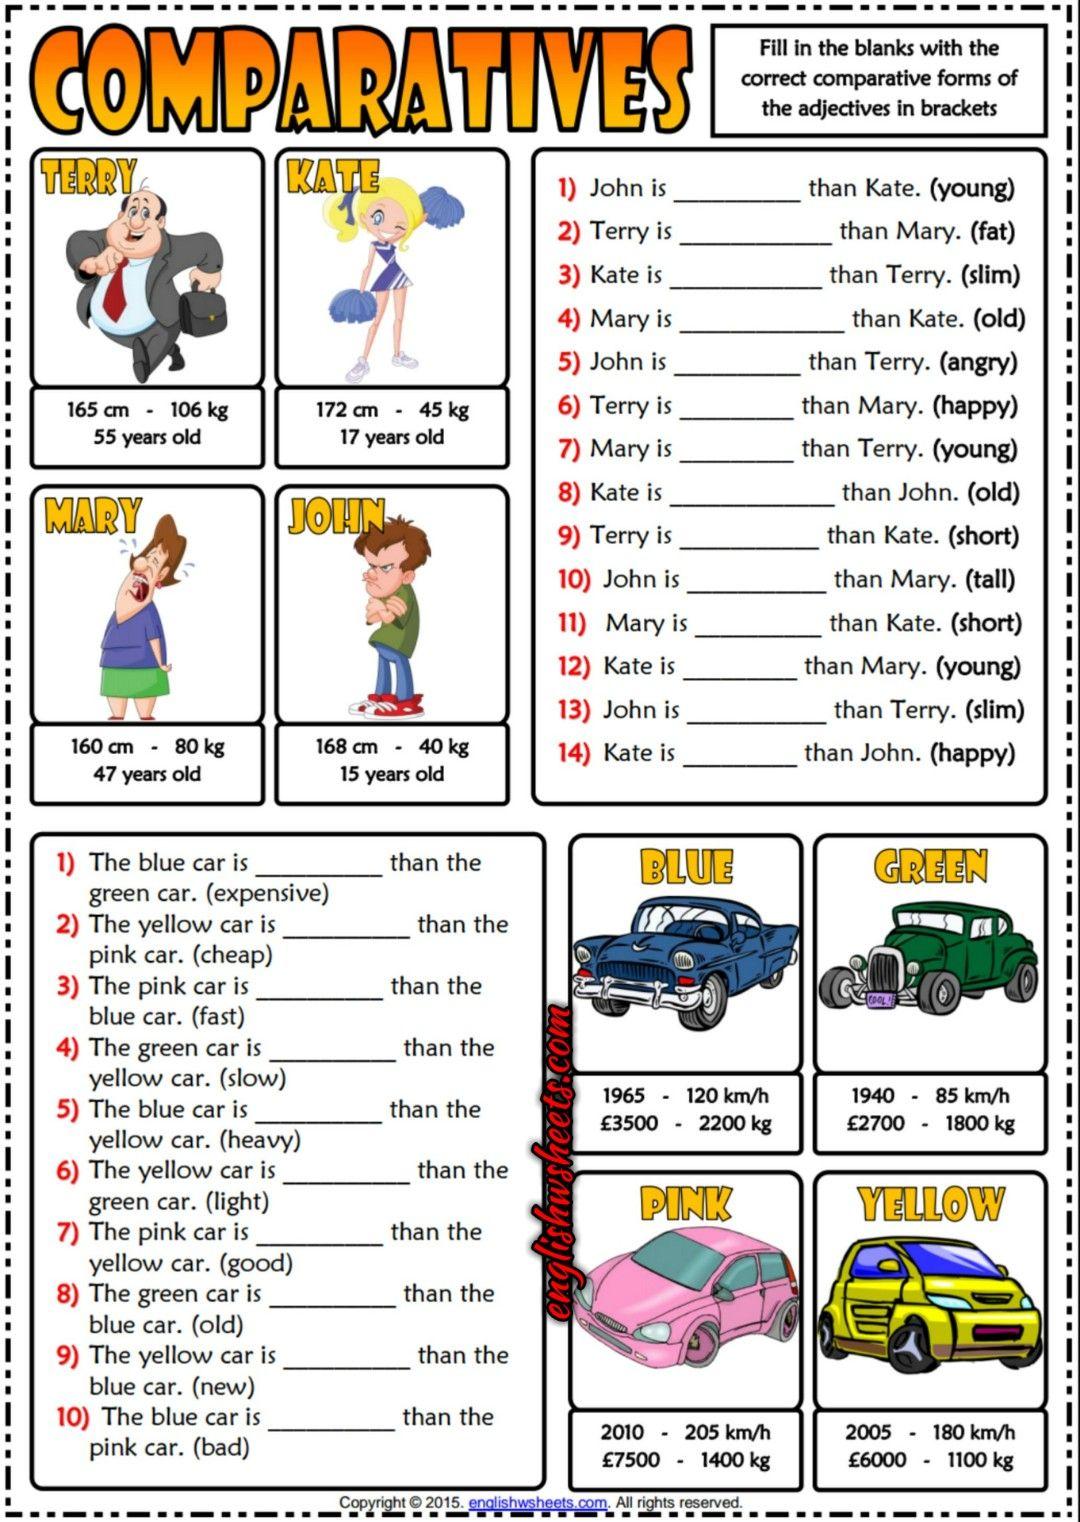 Comparatives ESL Printable Gap Fill Exercises Quiz For Kids ...